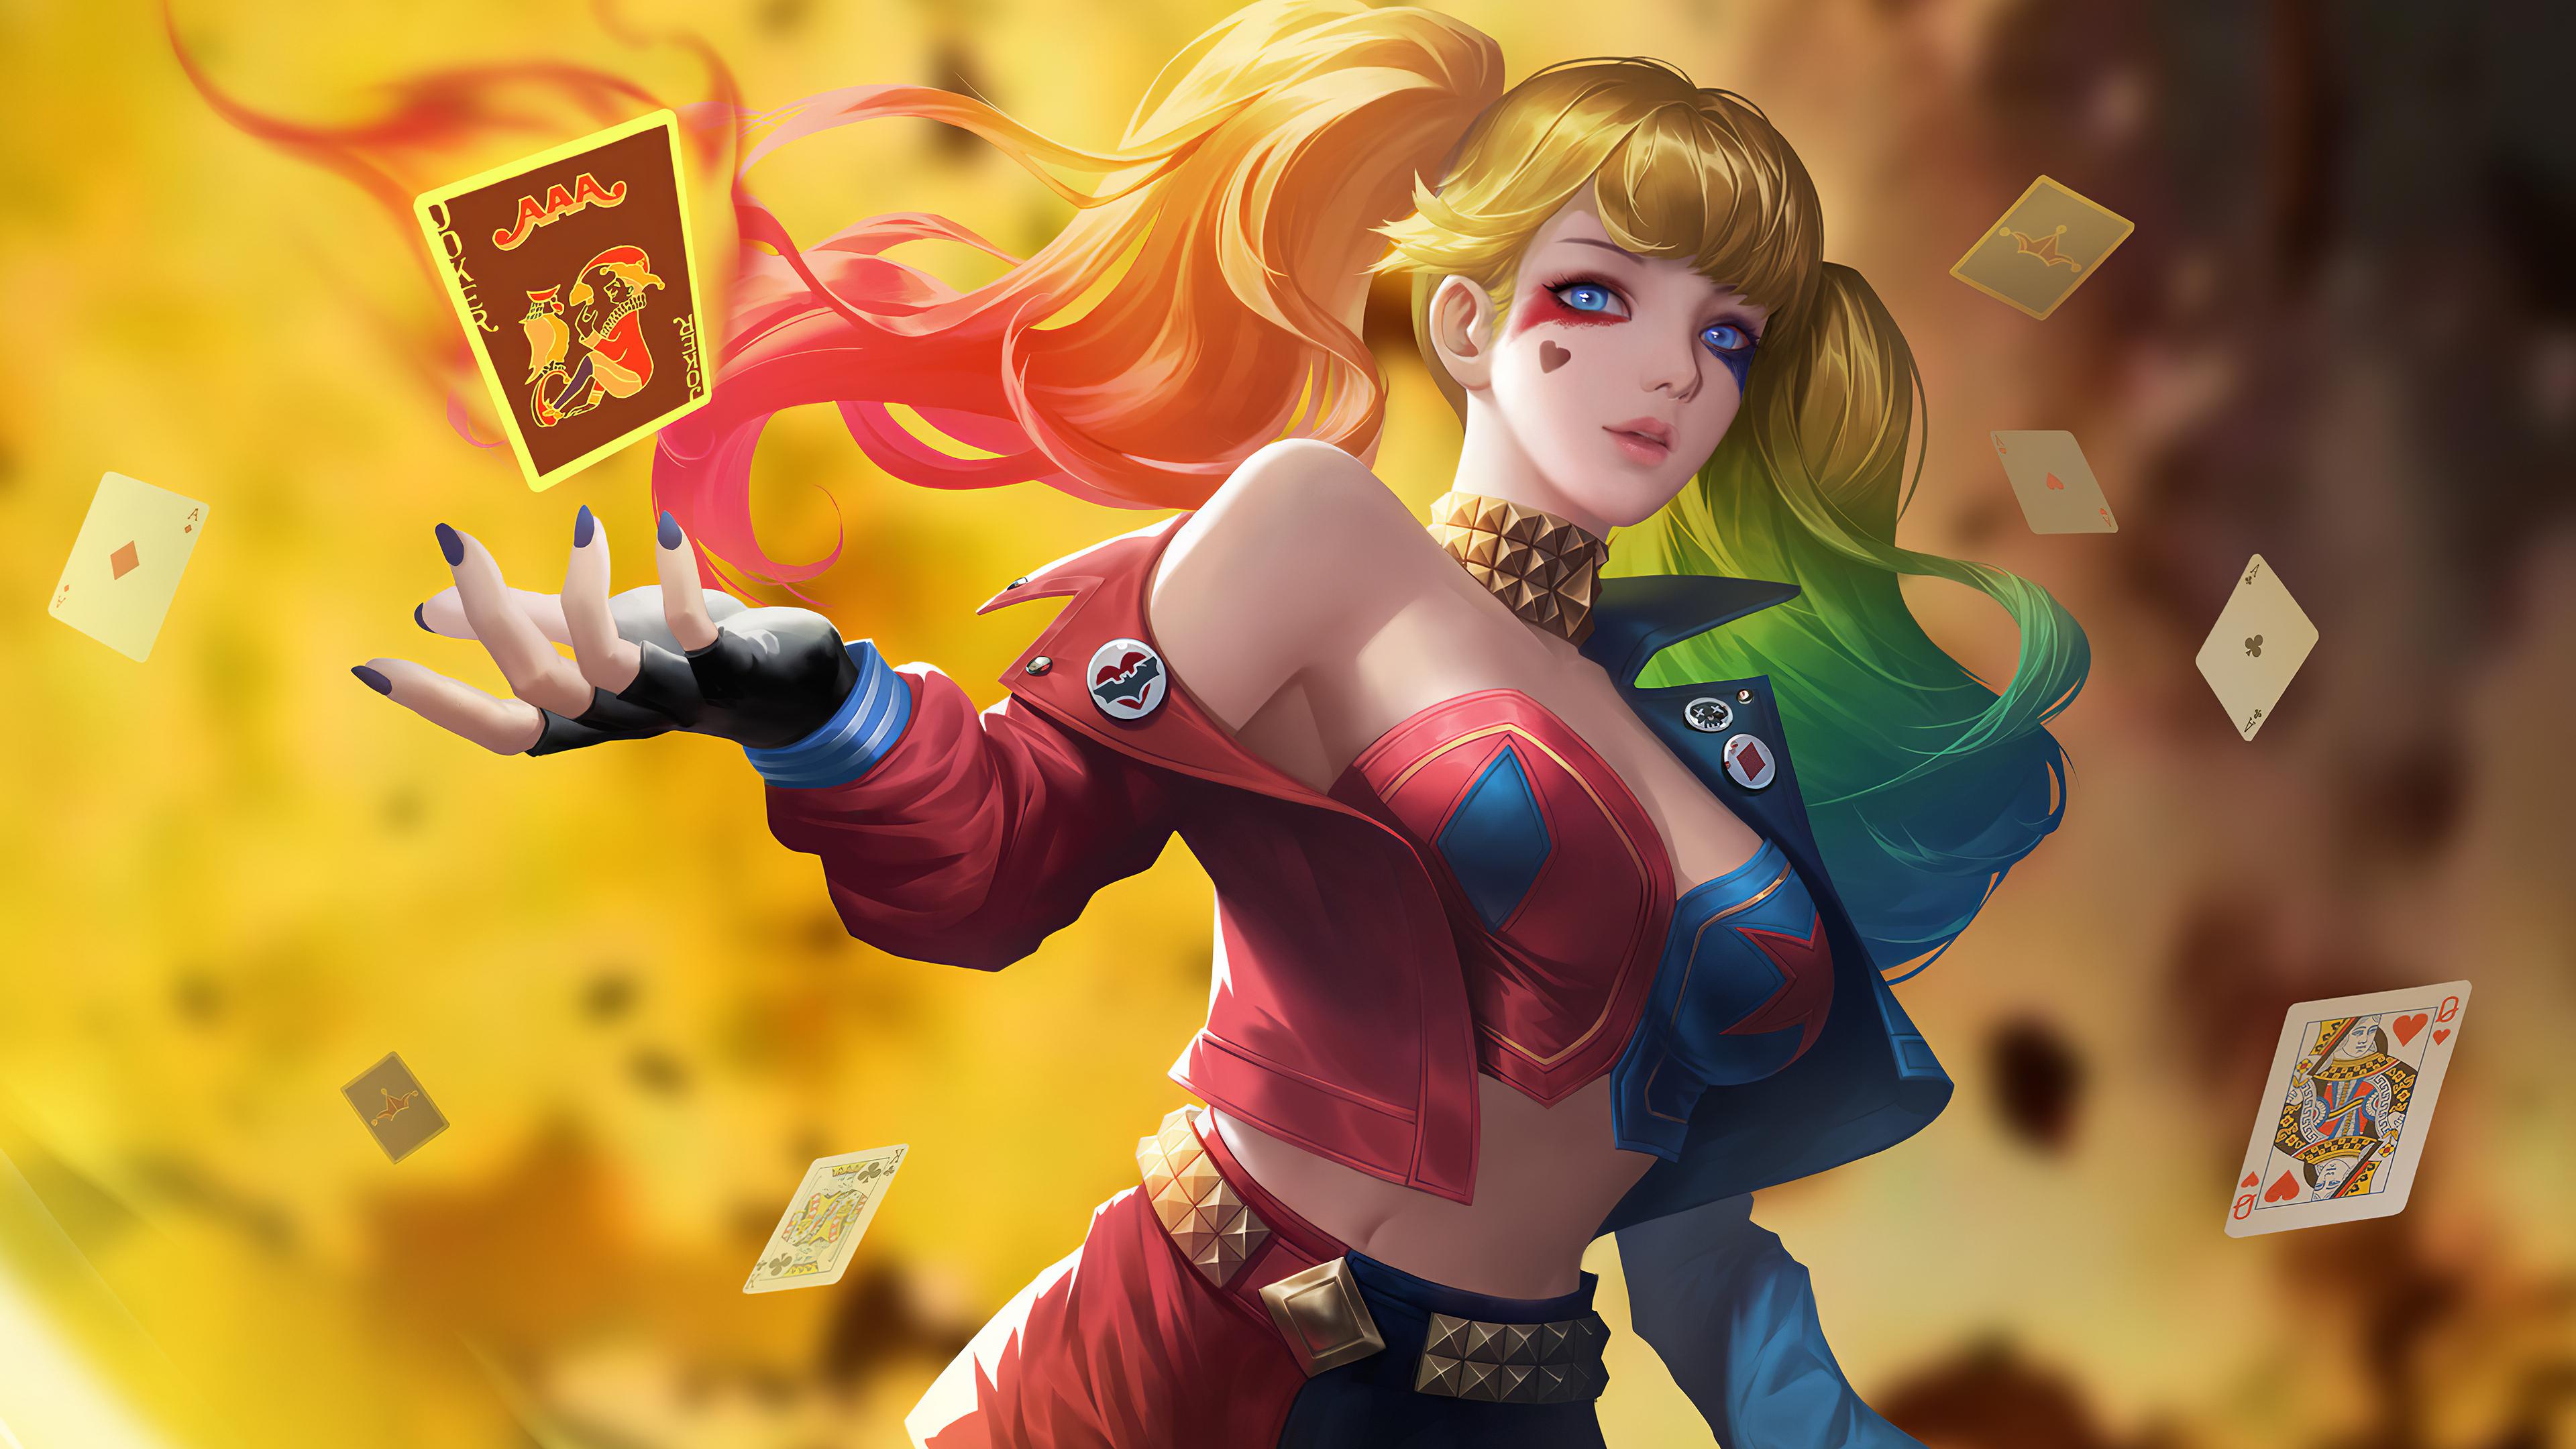 harley quinn play with me art 1572368976 - Harley Quinn Play With Me Art - superheroes wallpapers, hd-wallpapers, harley quinn wallpapers, digital art wallpapers, artwork wallpapers, artstation wallpapers, artist wallpapers, 4k-wallpapers